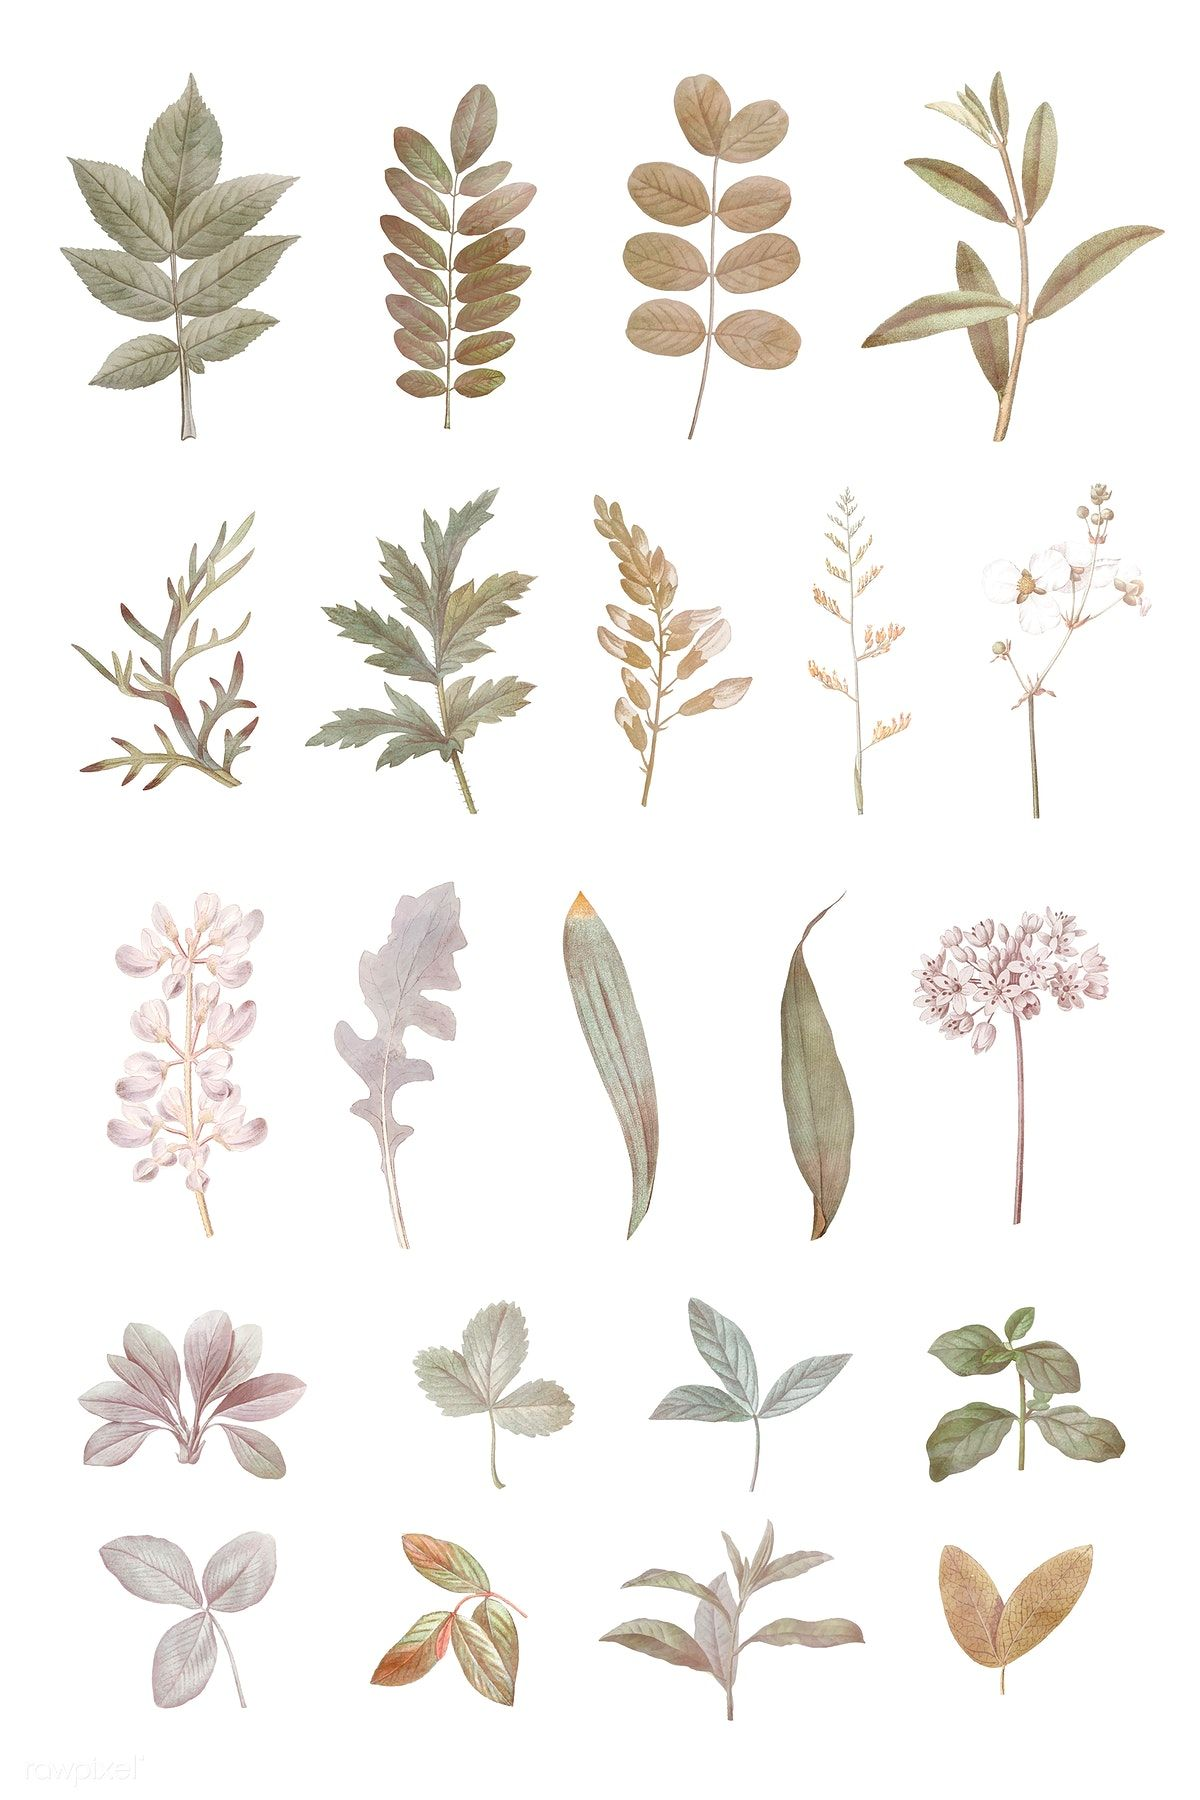 Download premium vector of Foliage design elements